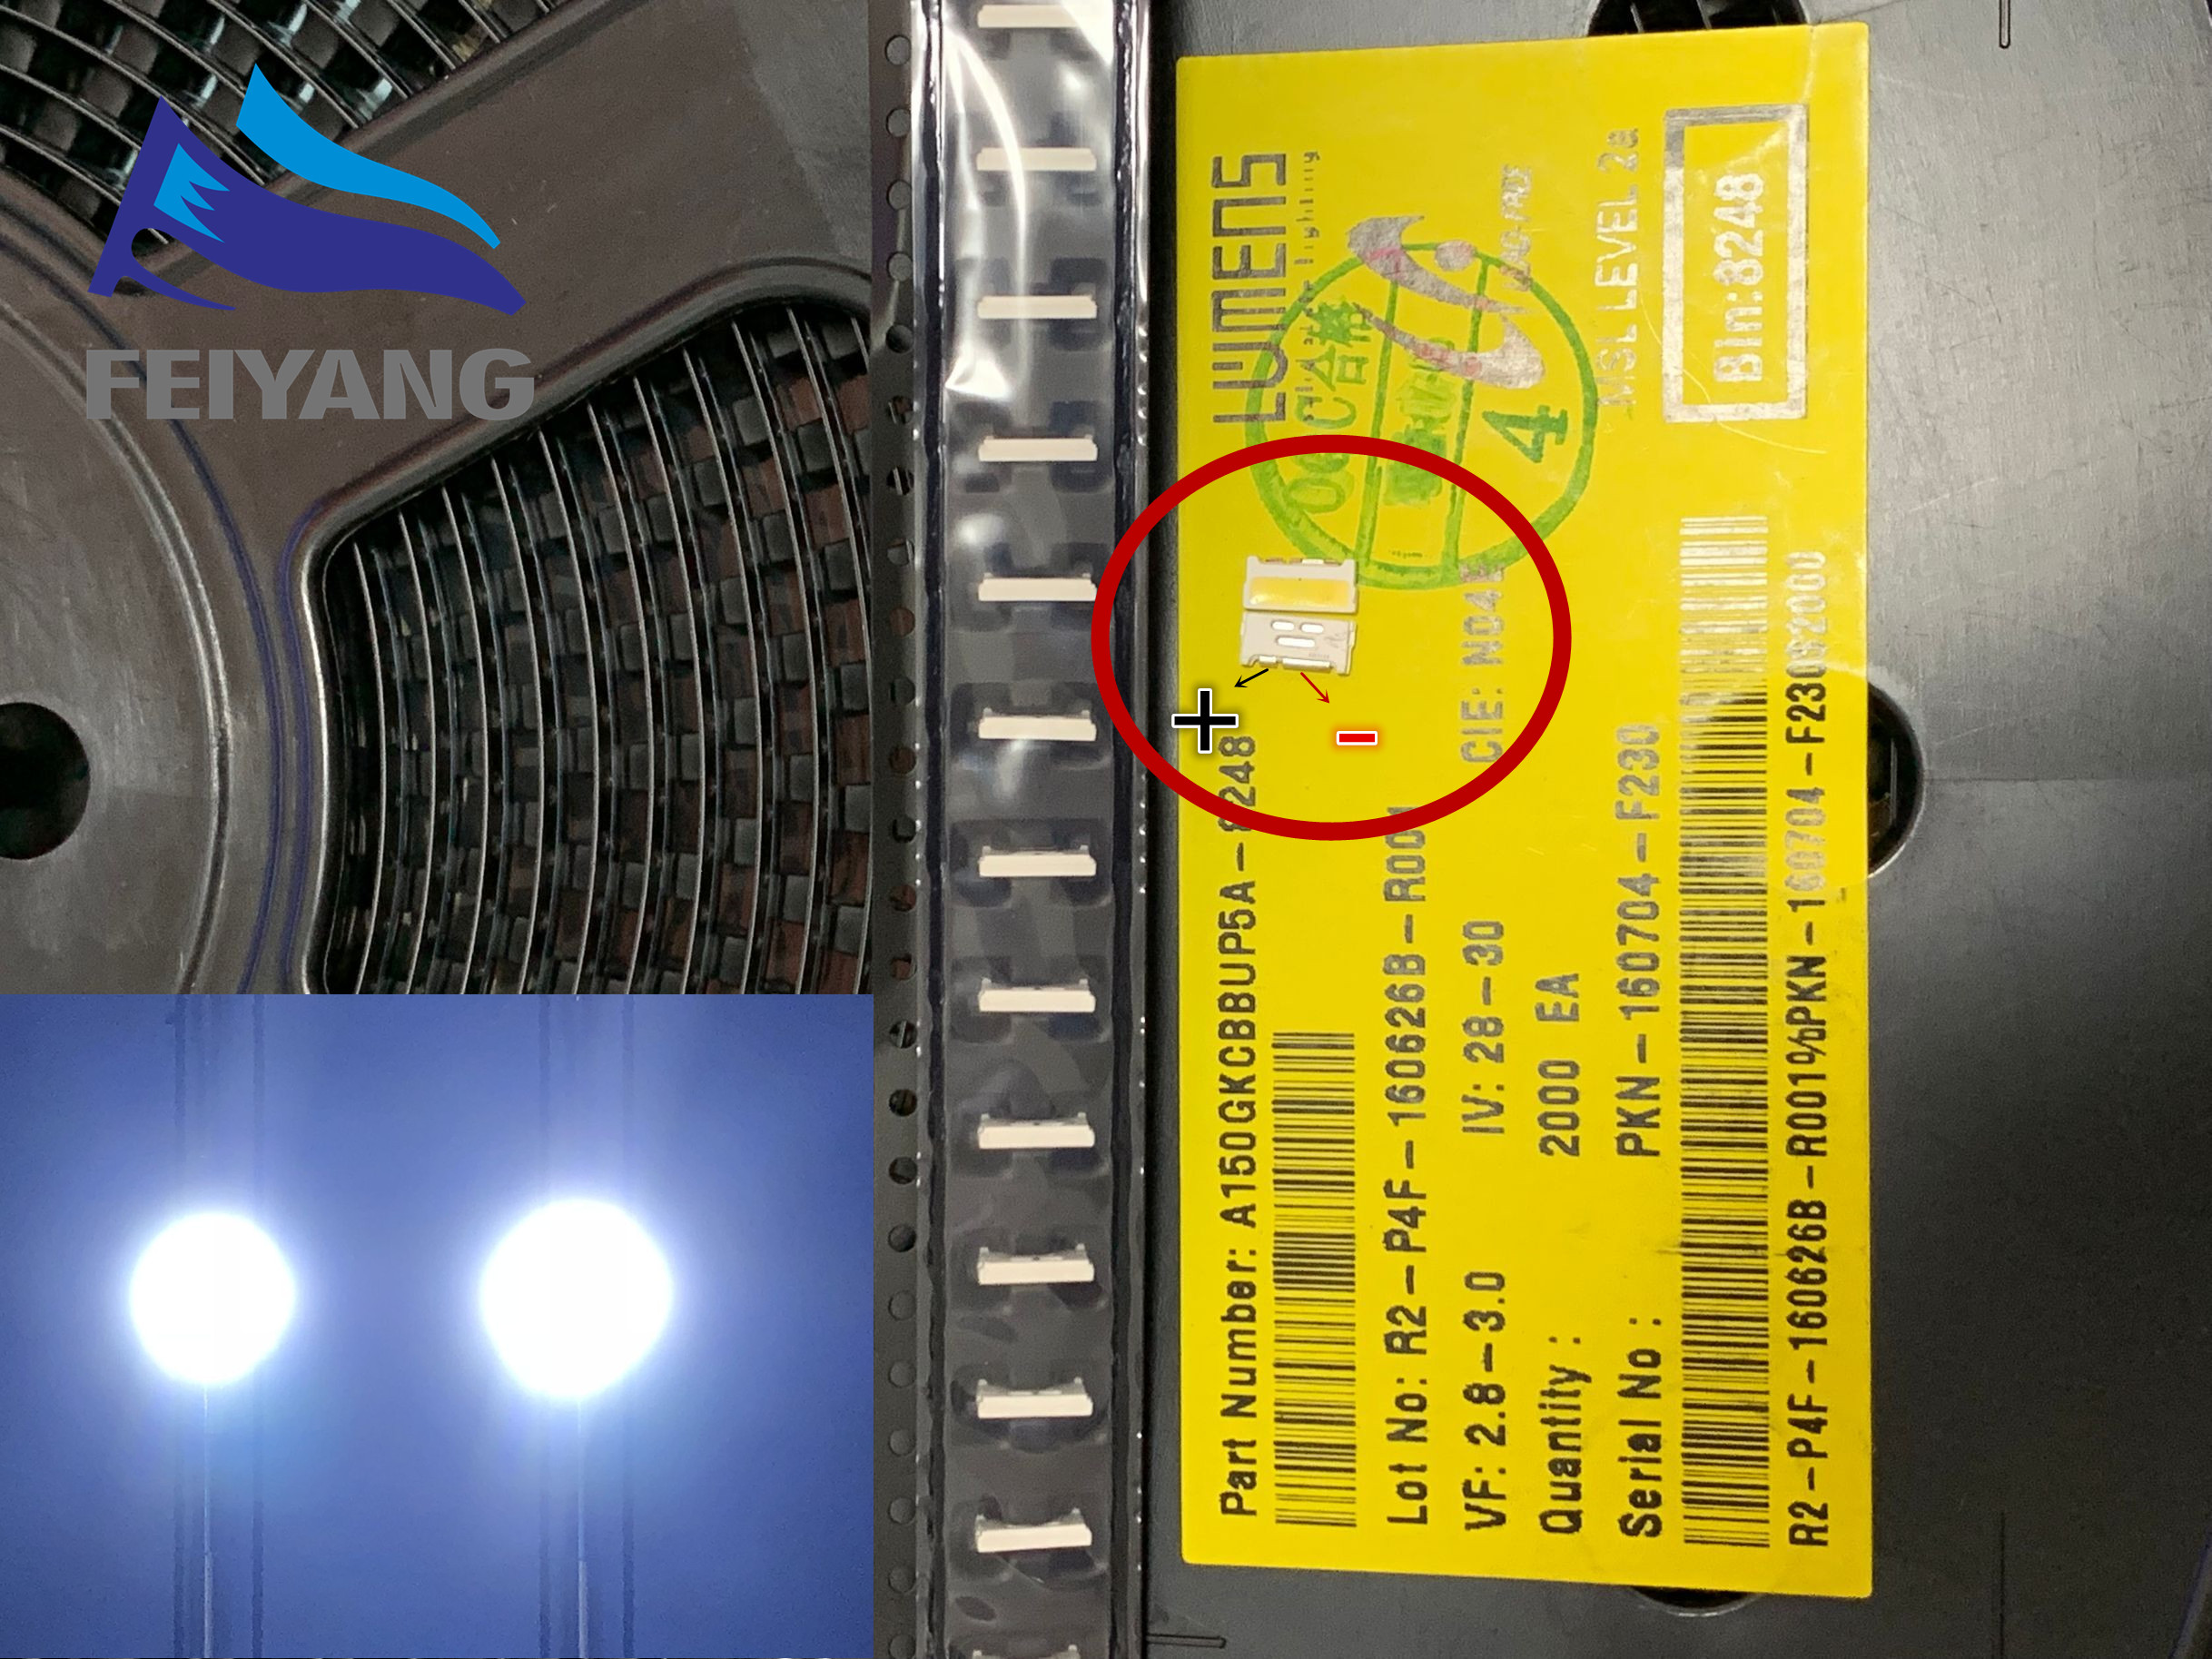 50pcs LUMENS LED Backlight Edge LED Series 0.7W 3V 7032 Cool white For SAMSUNG LED LCD Backlight TV Applicatio A150GKCBBUP5A